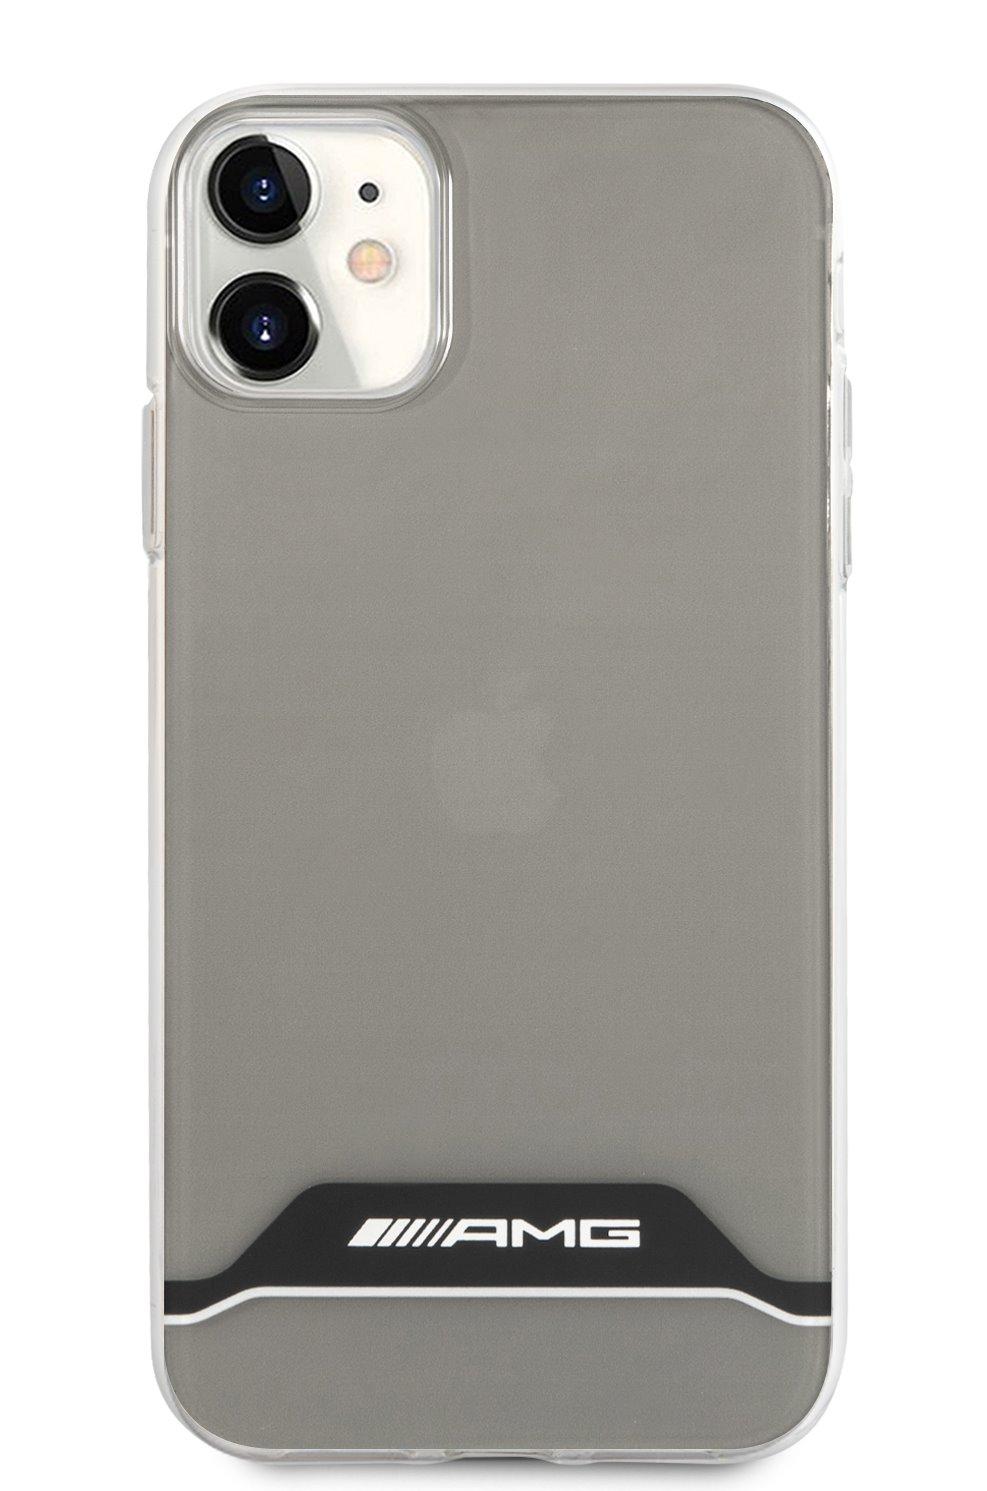 AMHCN61TCBW AMG PC/TPU Horizontal Stripes Kryt pro iPhone 11 Black 3666339014568